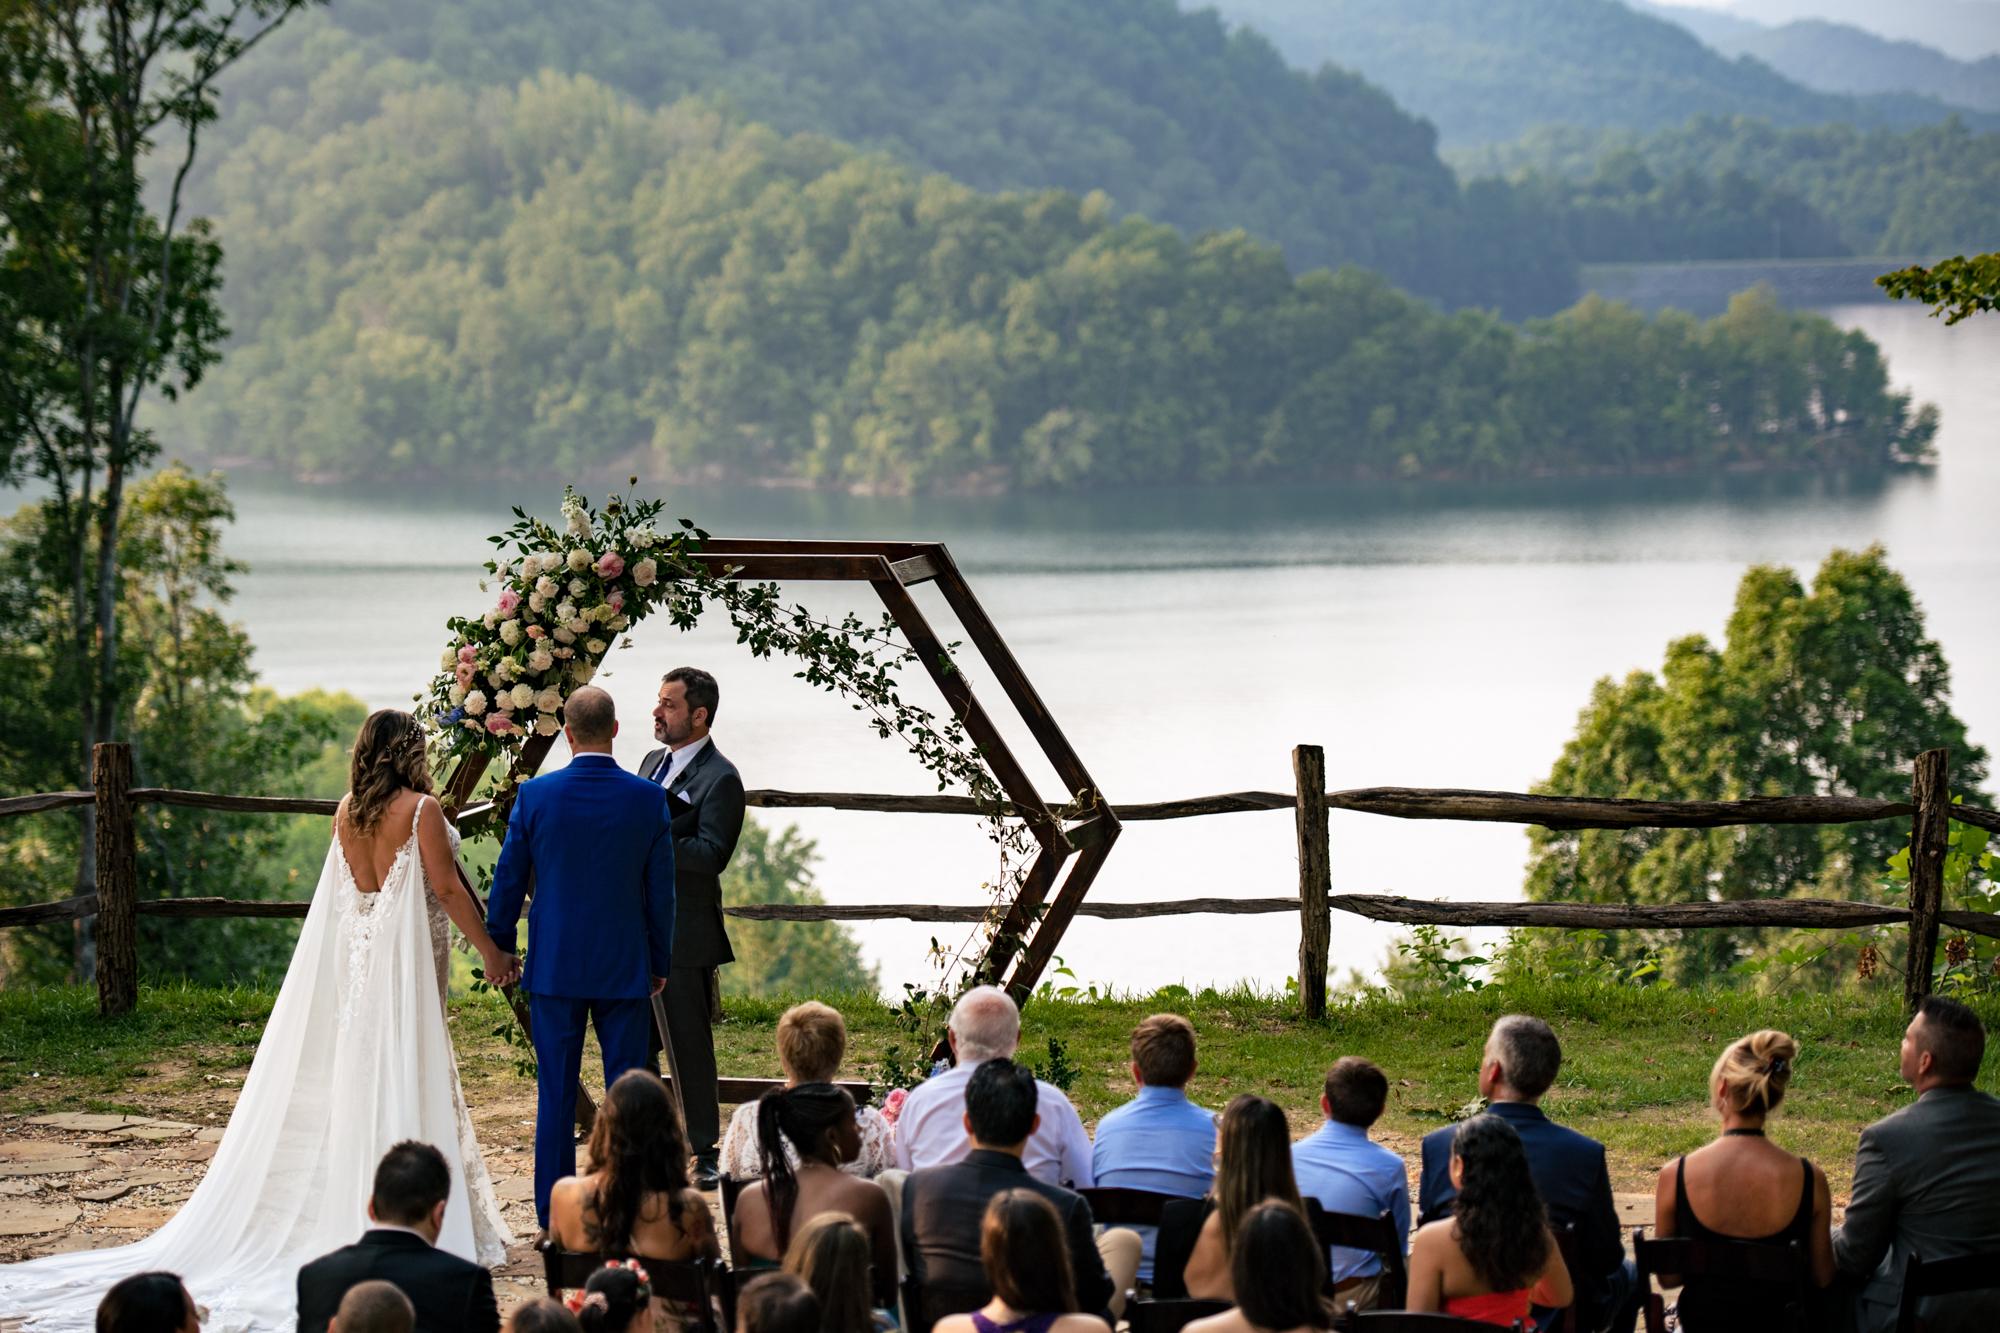 bride and groom at wedding ceremony at venue Nantahala weddings